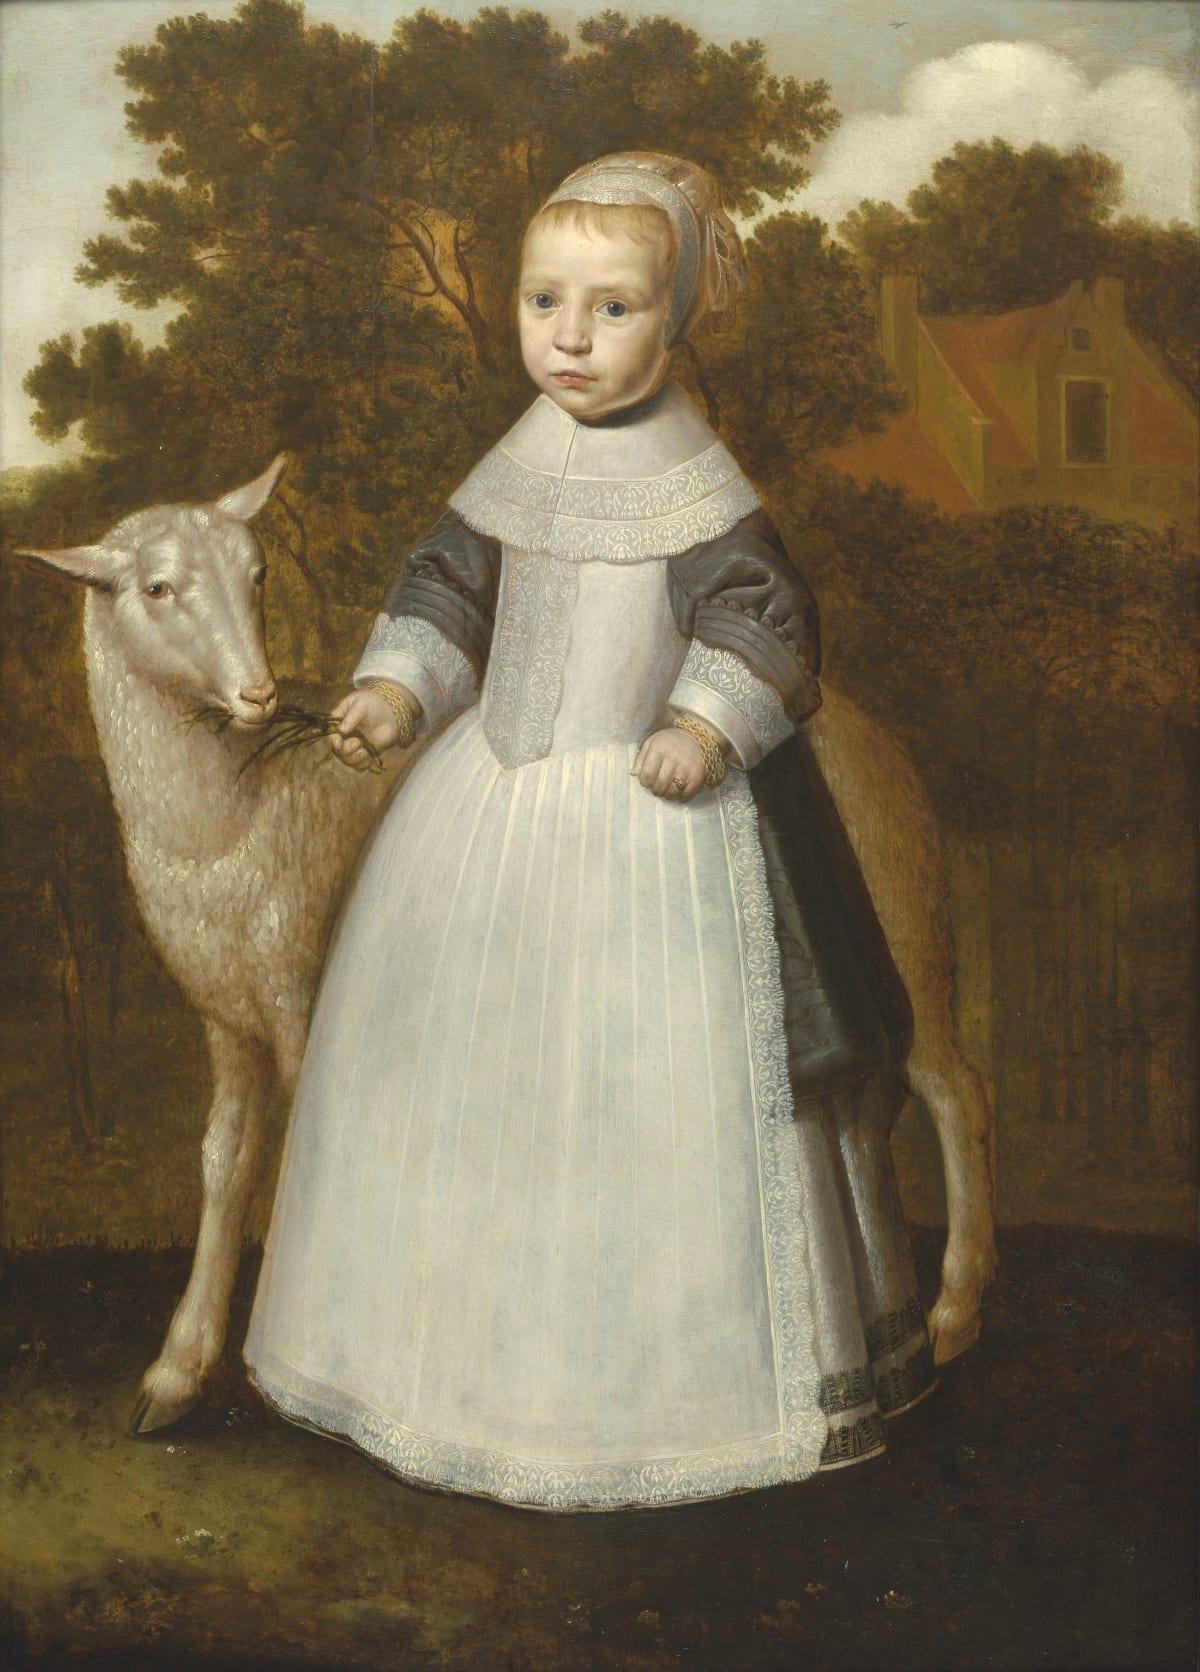 Dirck Dircksz. Santvoort (c. 1610 – 1680) An Unknown Young Girl with a Lamb , circa 1640 Oil on panel 42 ½ x 30 ¾ in. (108.2 x 78.3 cm.)